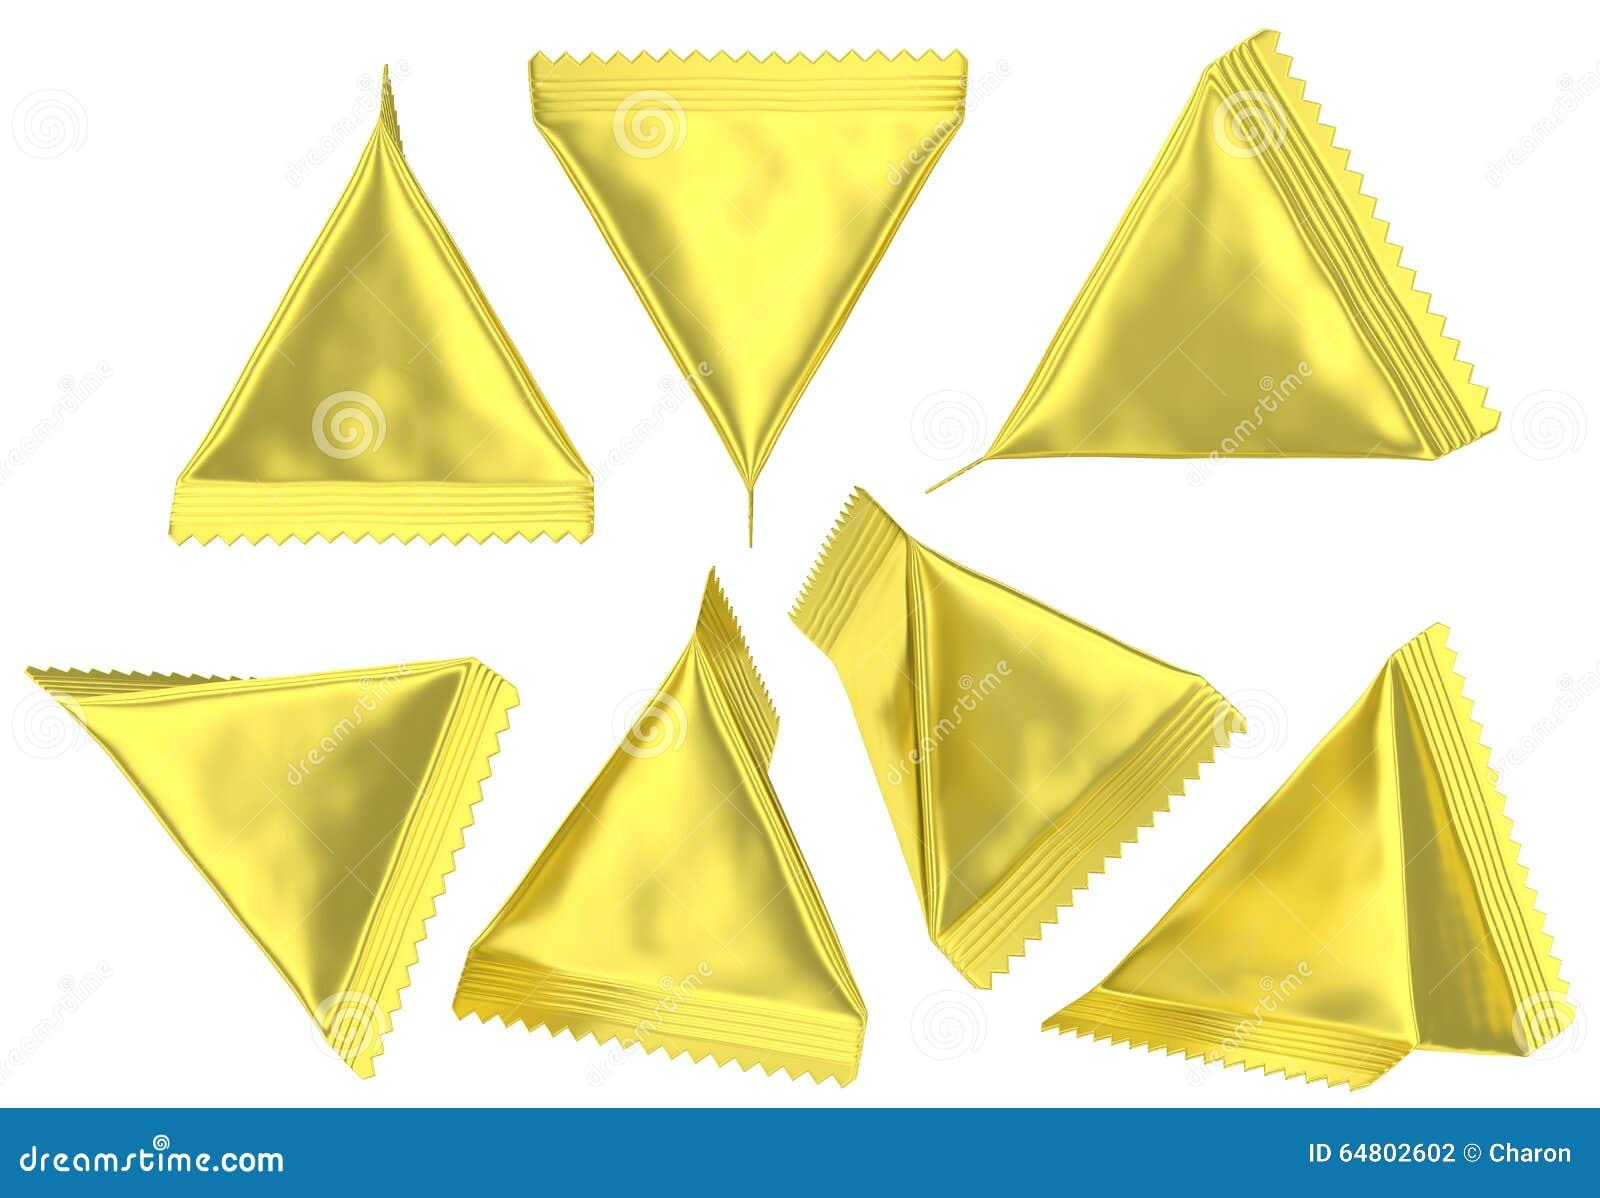 Golden foil tetrahedral plastic bag